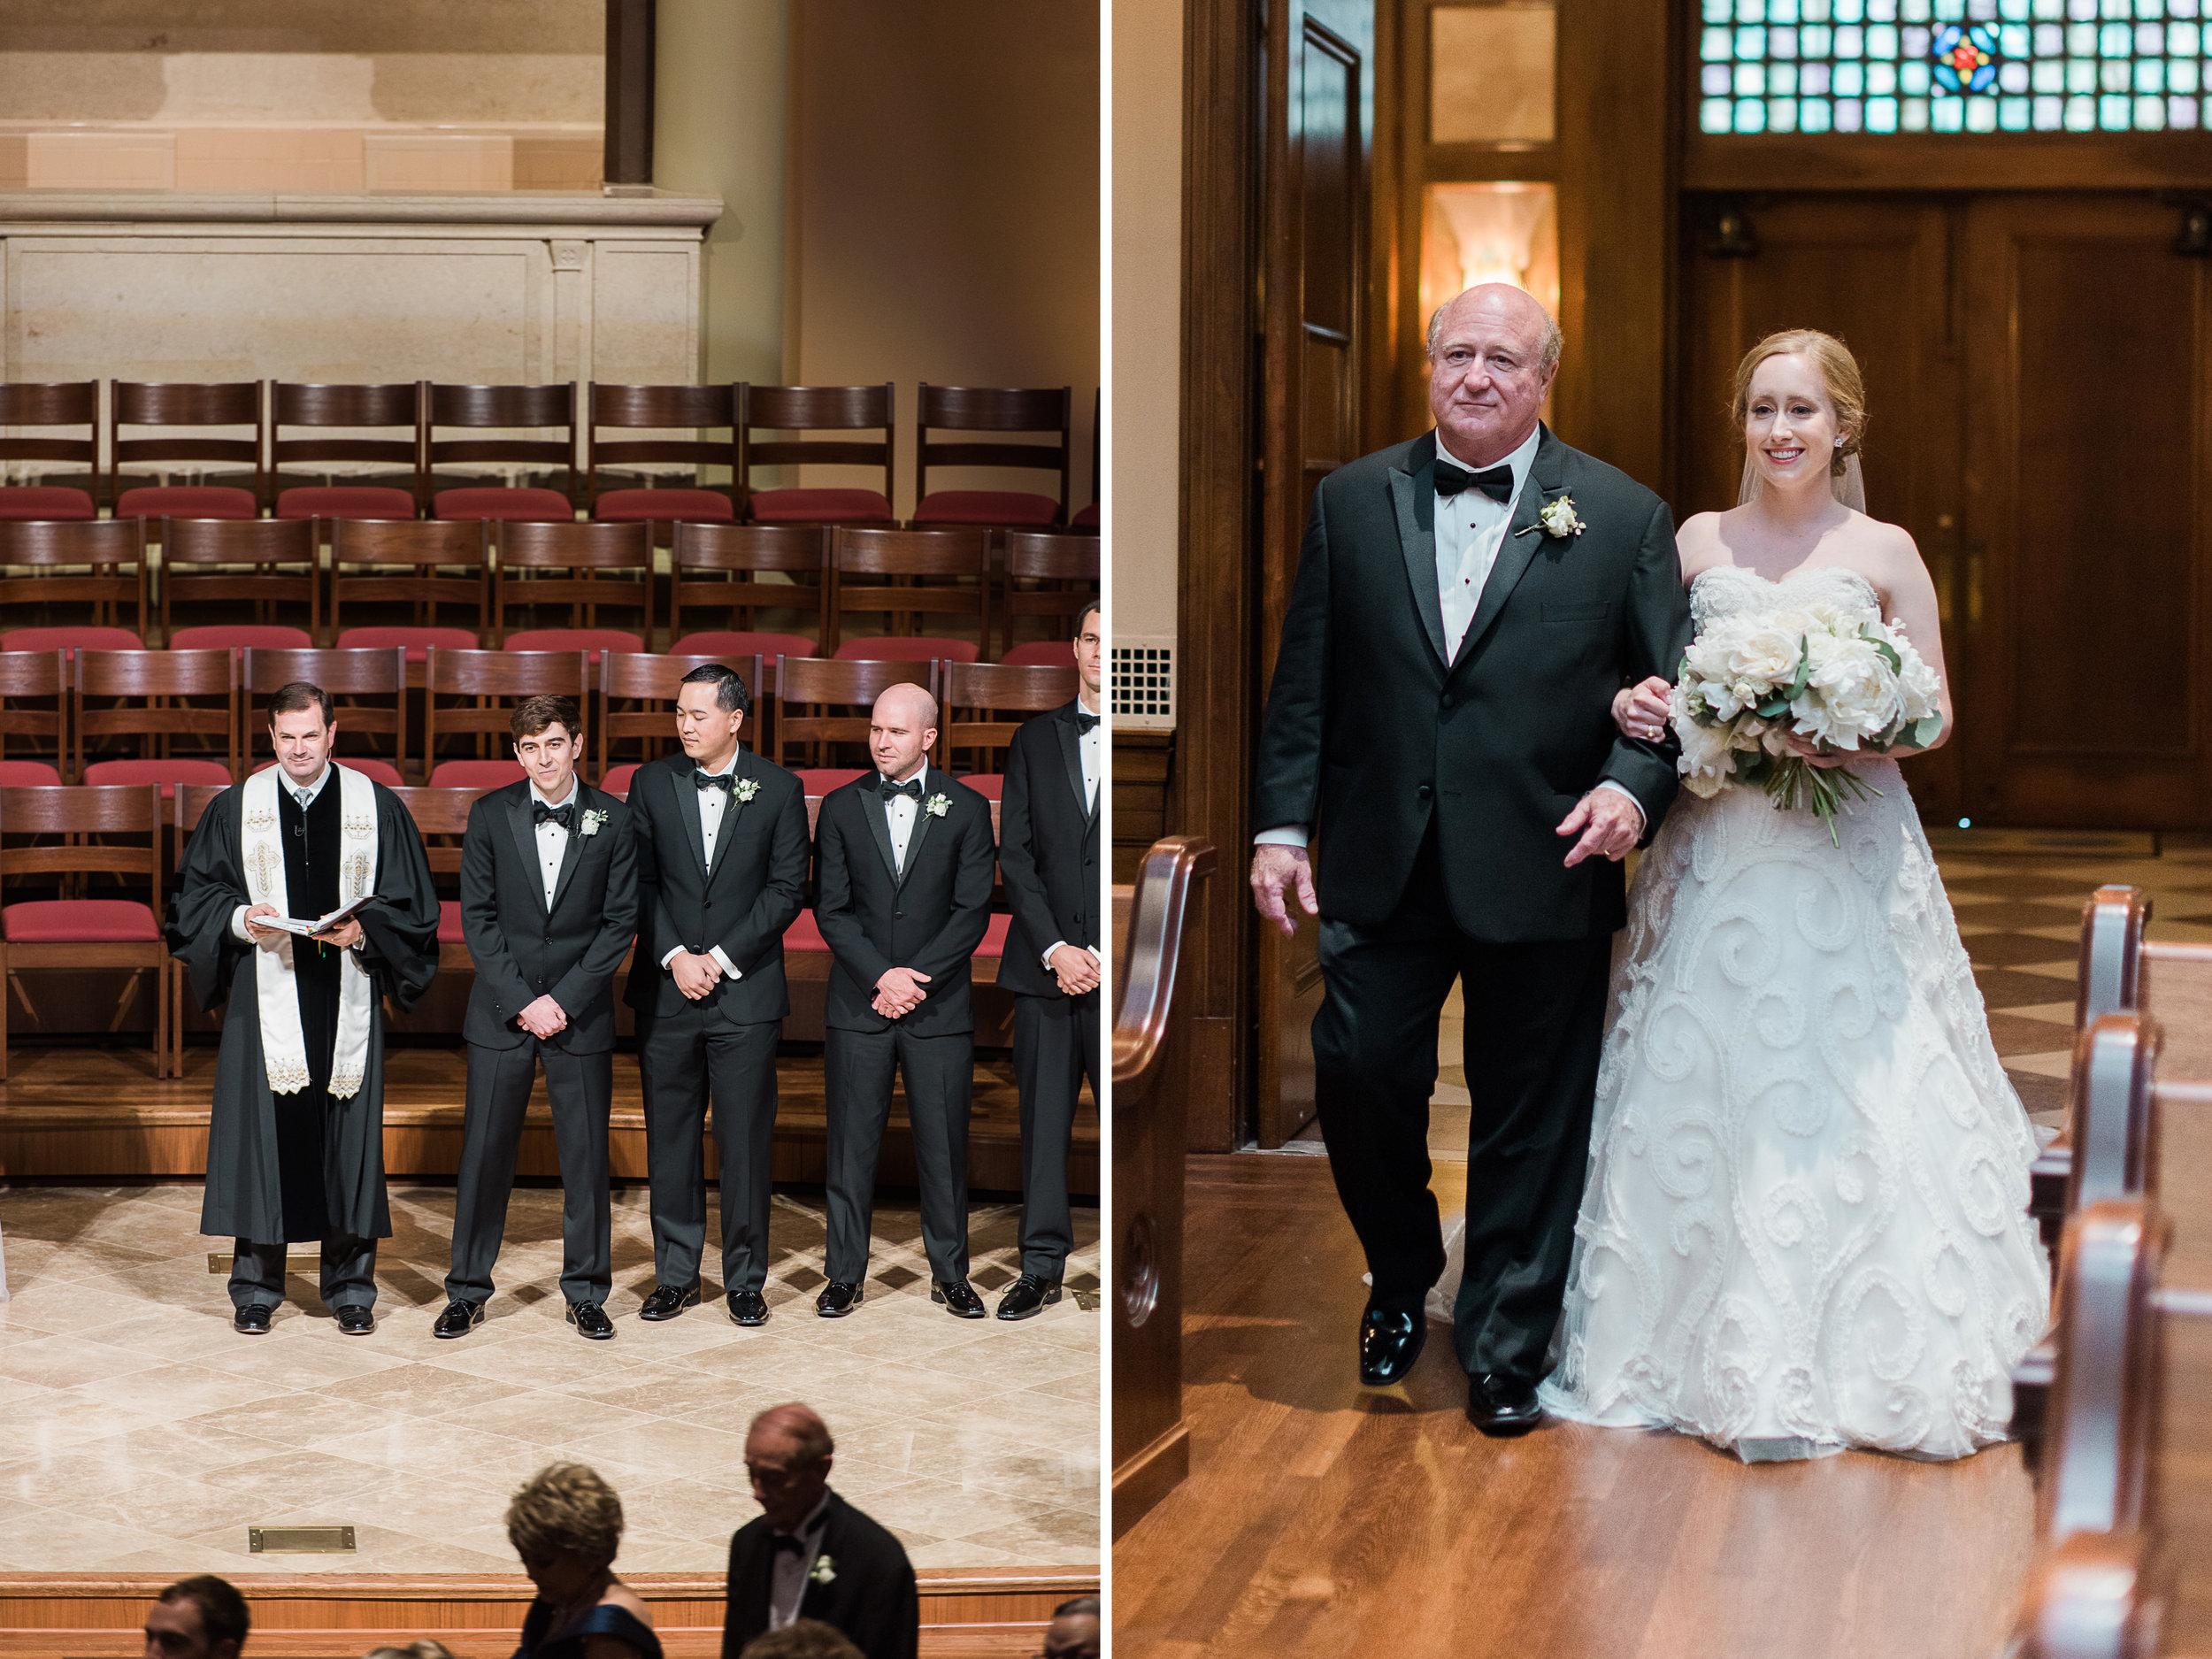 Fine-Art-Film-Houston-Wedding-Photographer-Best-Top-Luxury-Texas-Austin-Dallas-Destination-Dana-Fernandez-Photography-River-Oaks-Country-Club-South-Main-Baptist-Ceremony-Reception-Wedding-133.jpg